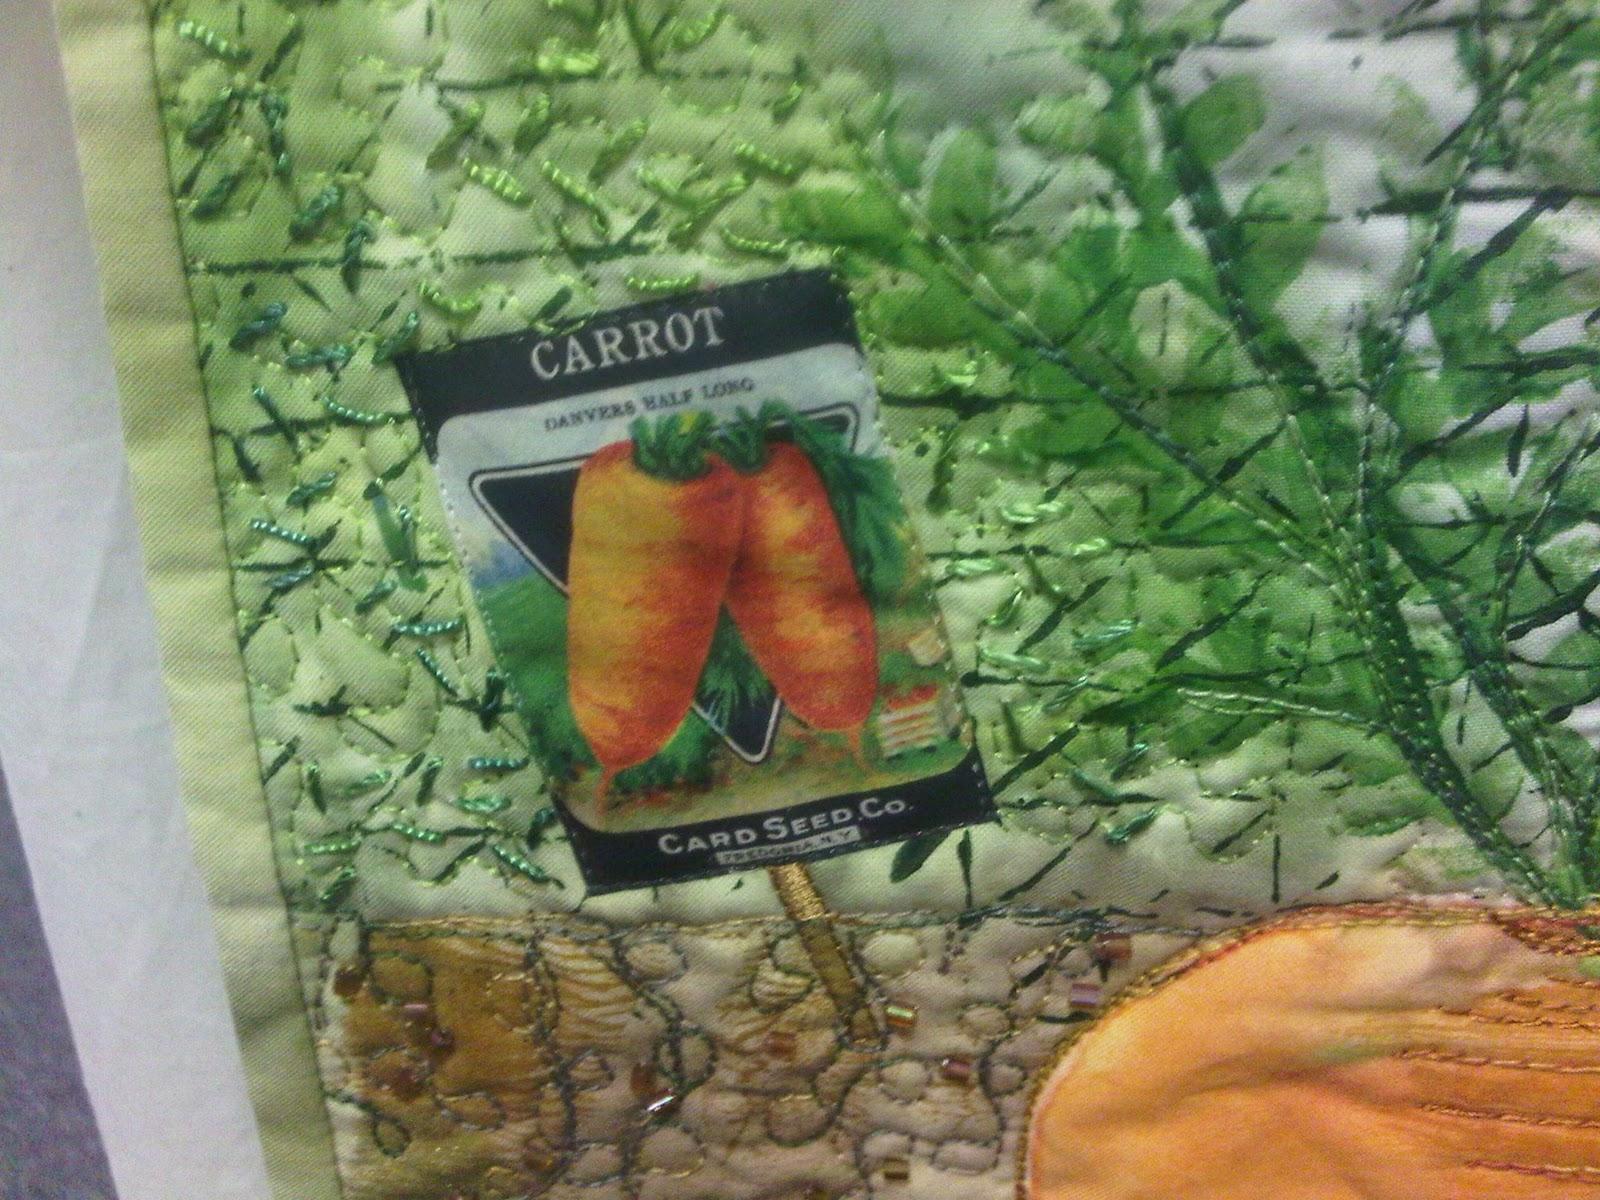 http://4.bp.blogspot.com/_vie0np-pcbY/TKCUV8YzY6I/AAAAAAAABEY/TrSDWlccGiU/s1600/quilt+show+veg+close+up.JPG